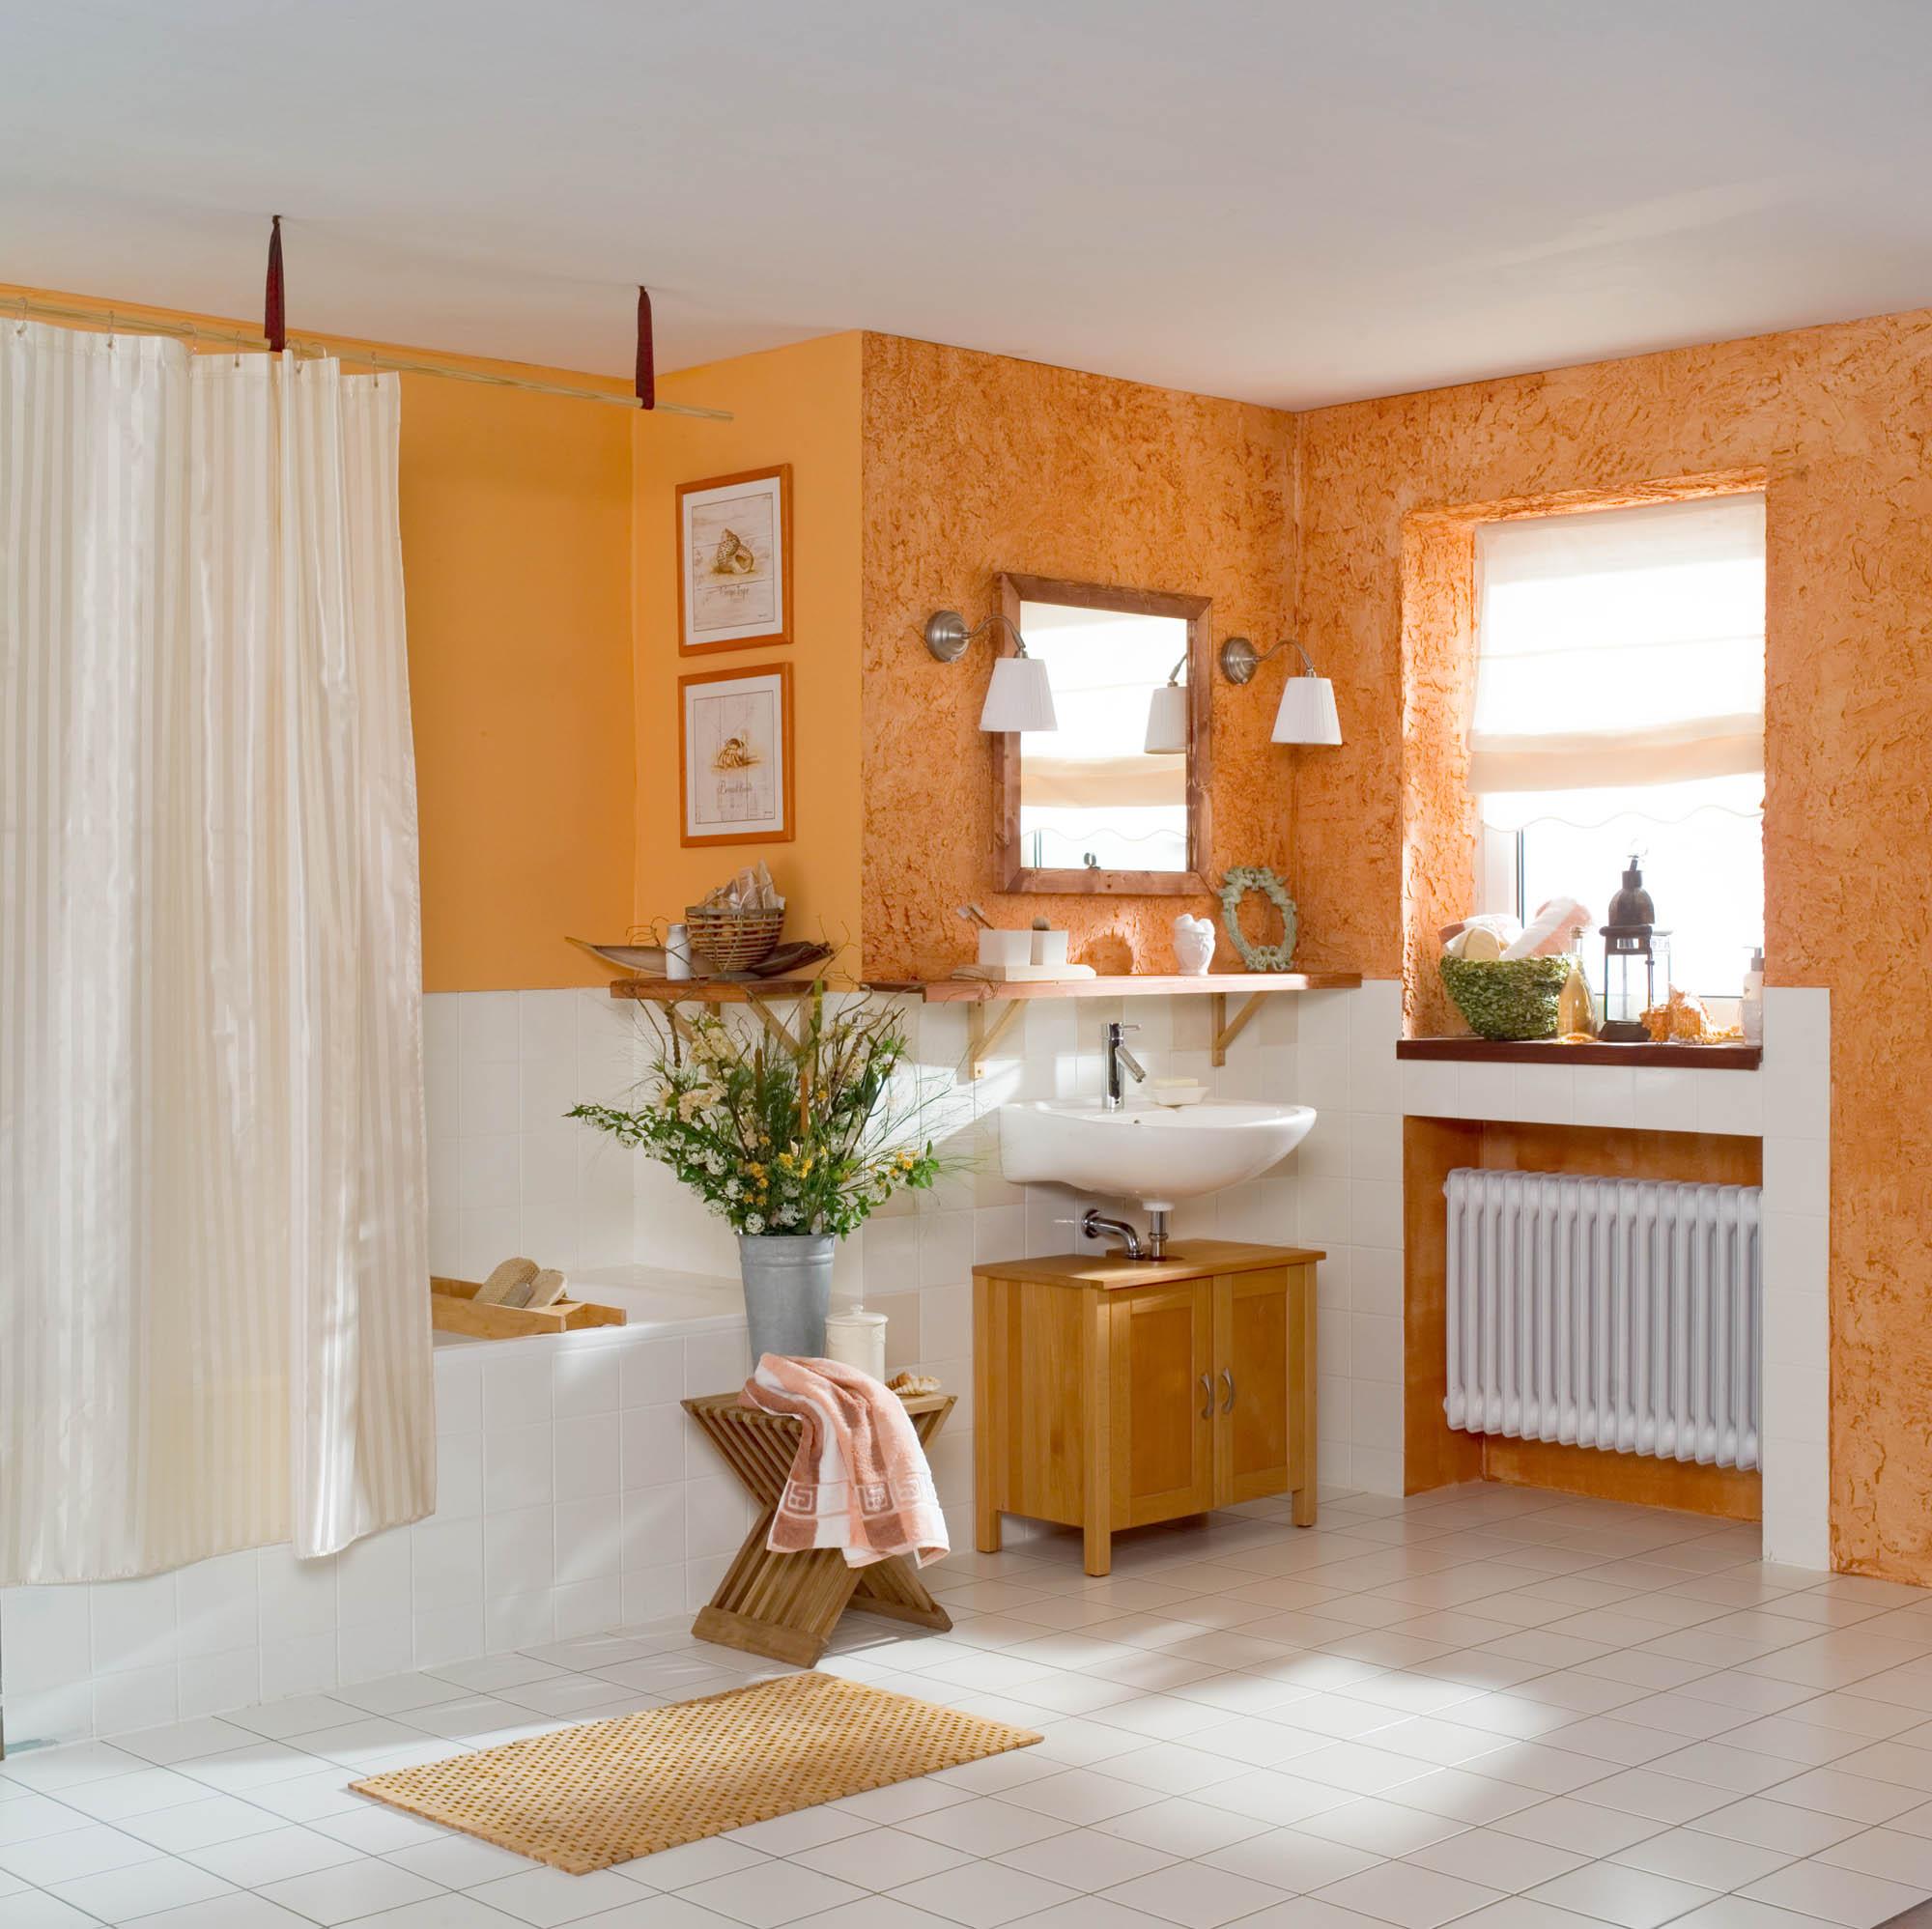 fliesenlack kosmetik f rs badezimmer immowelt ag pressemitteilung. Black Bedroom Furniture Sets. Home Design Ideas